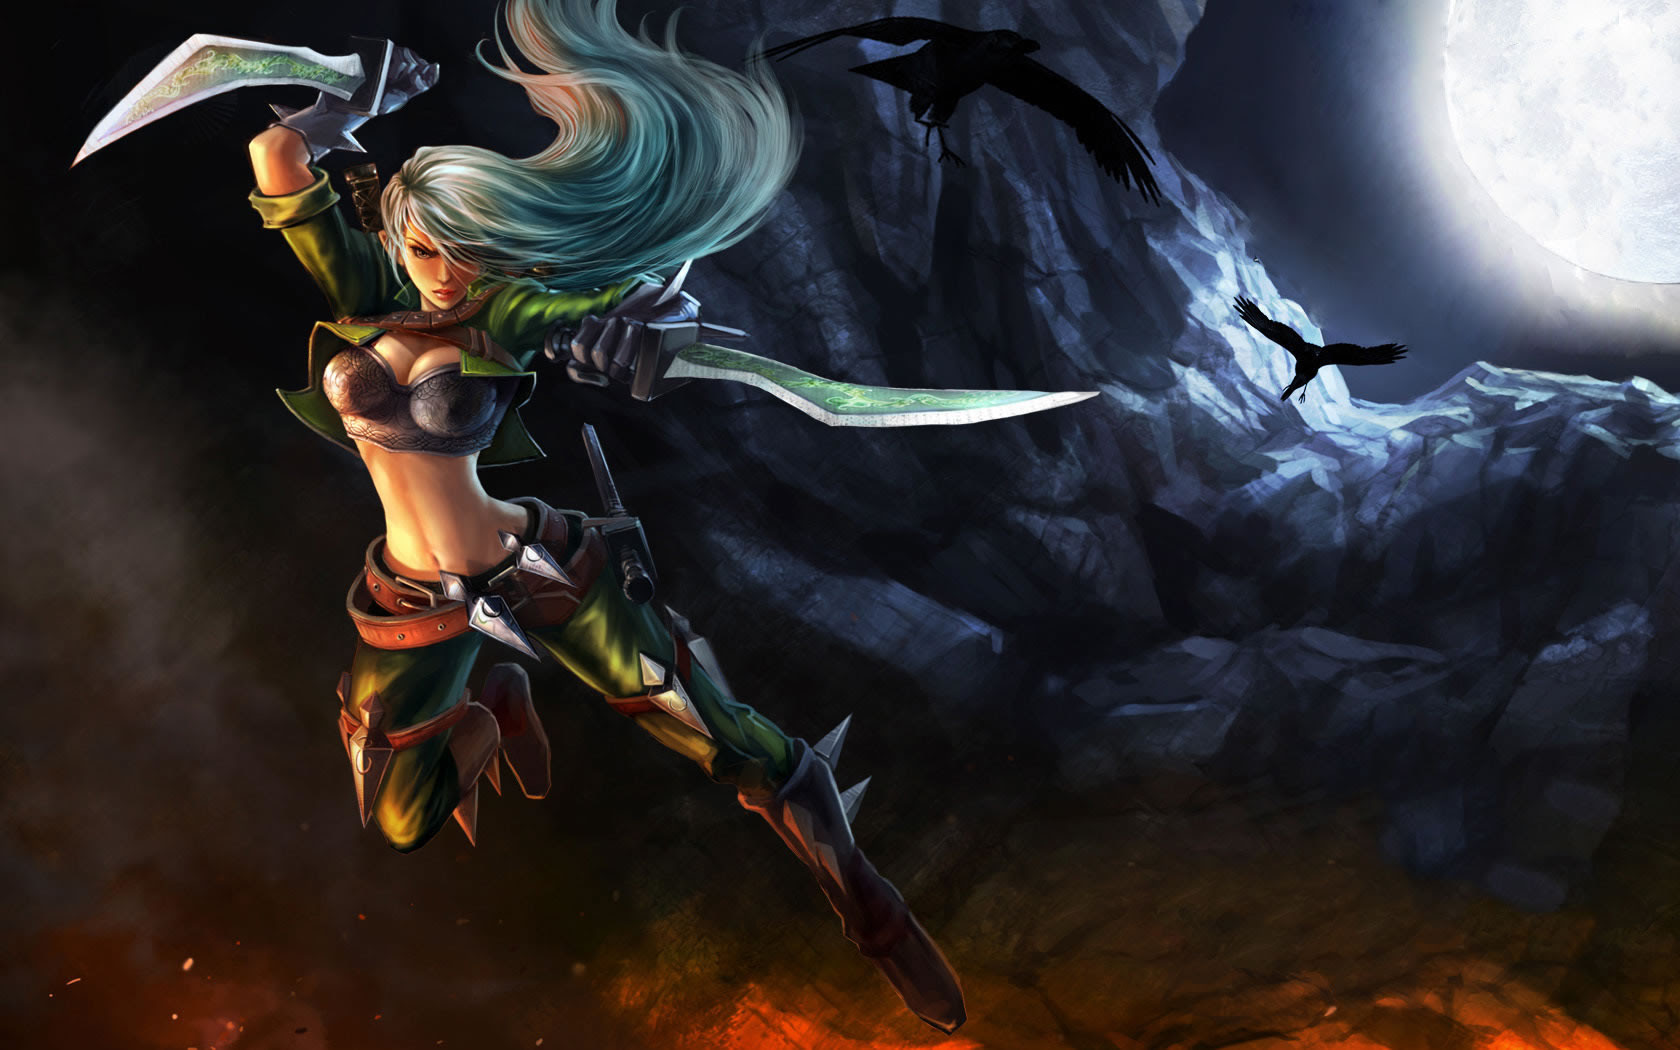 Mercenary Katarina Skin Chinese 2 League Of Legends Wallpapers